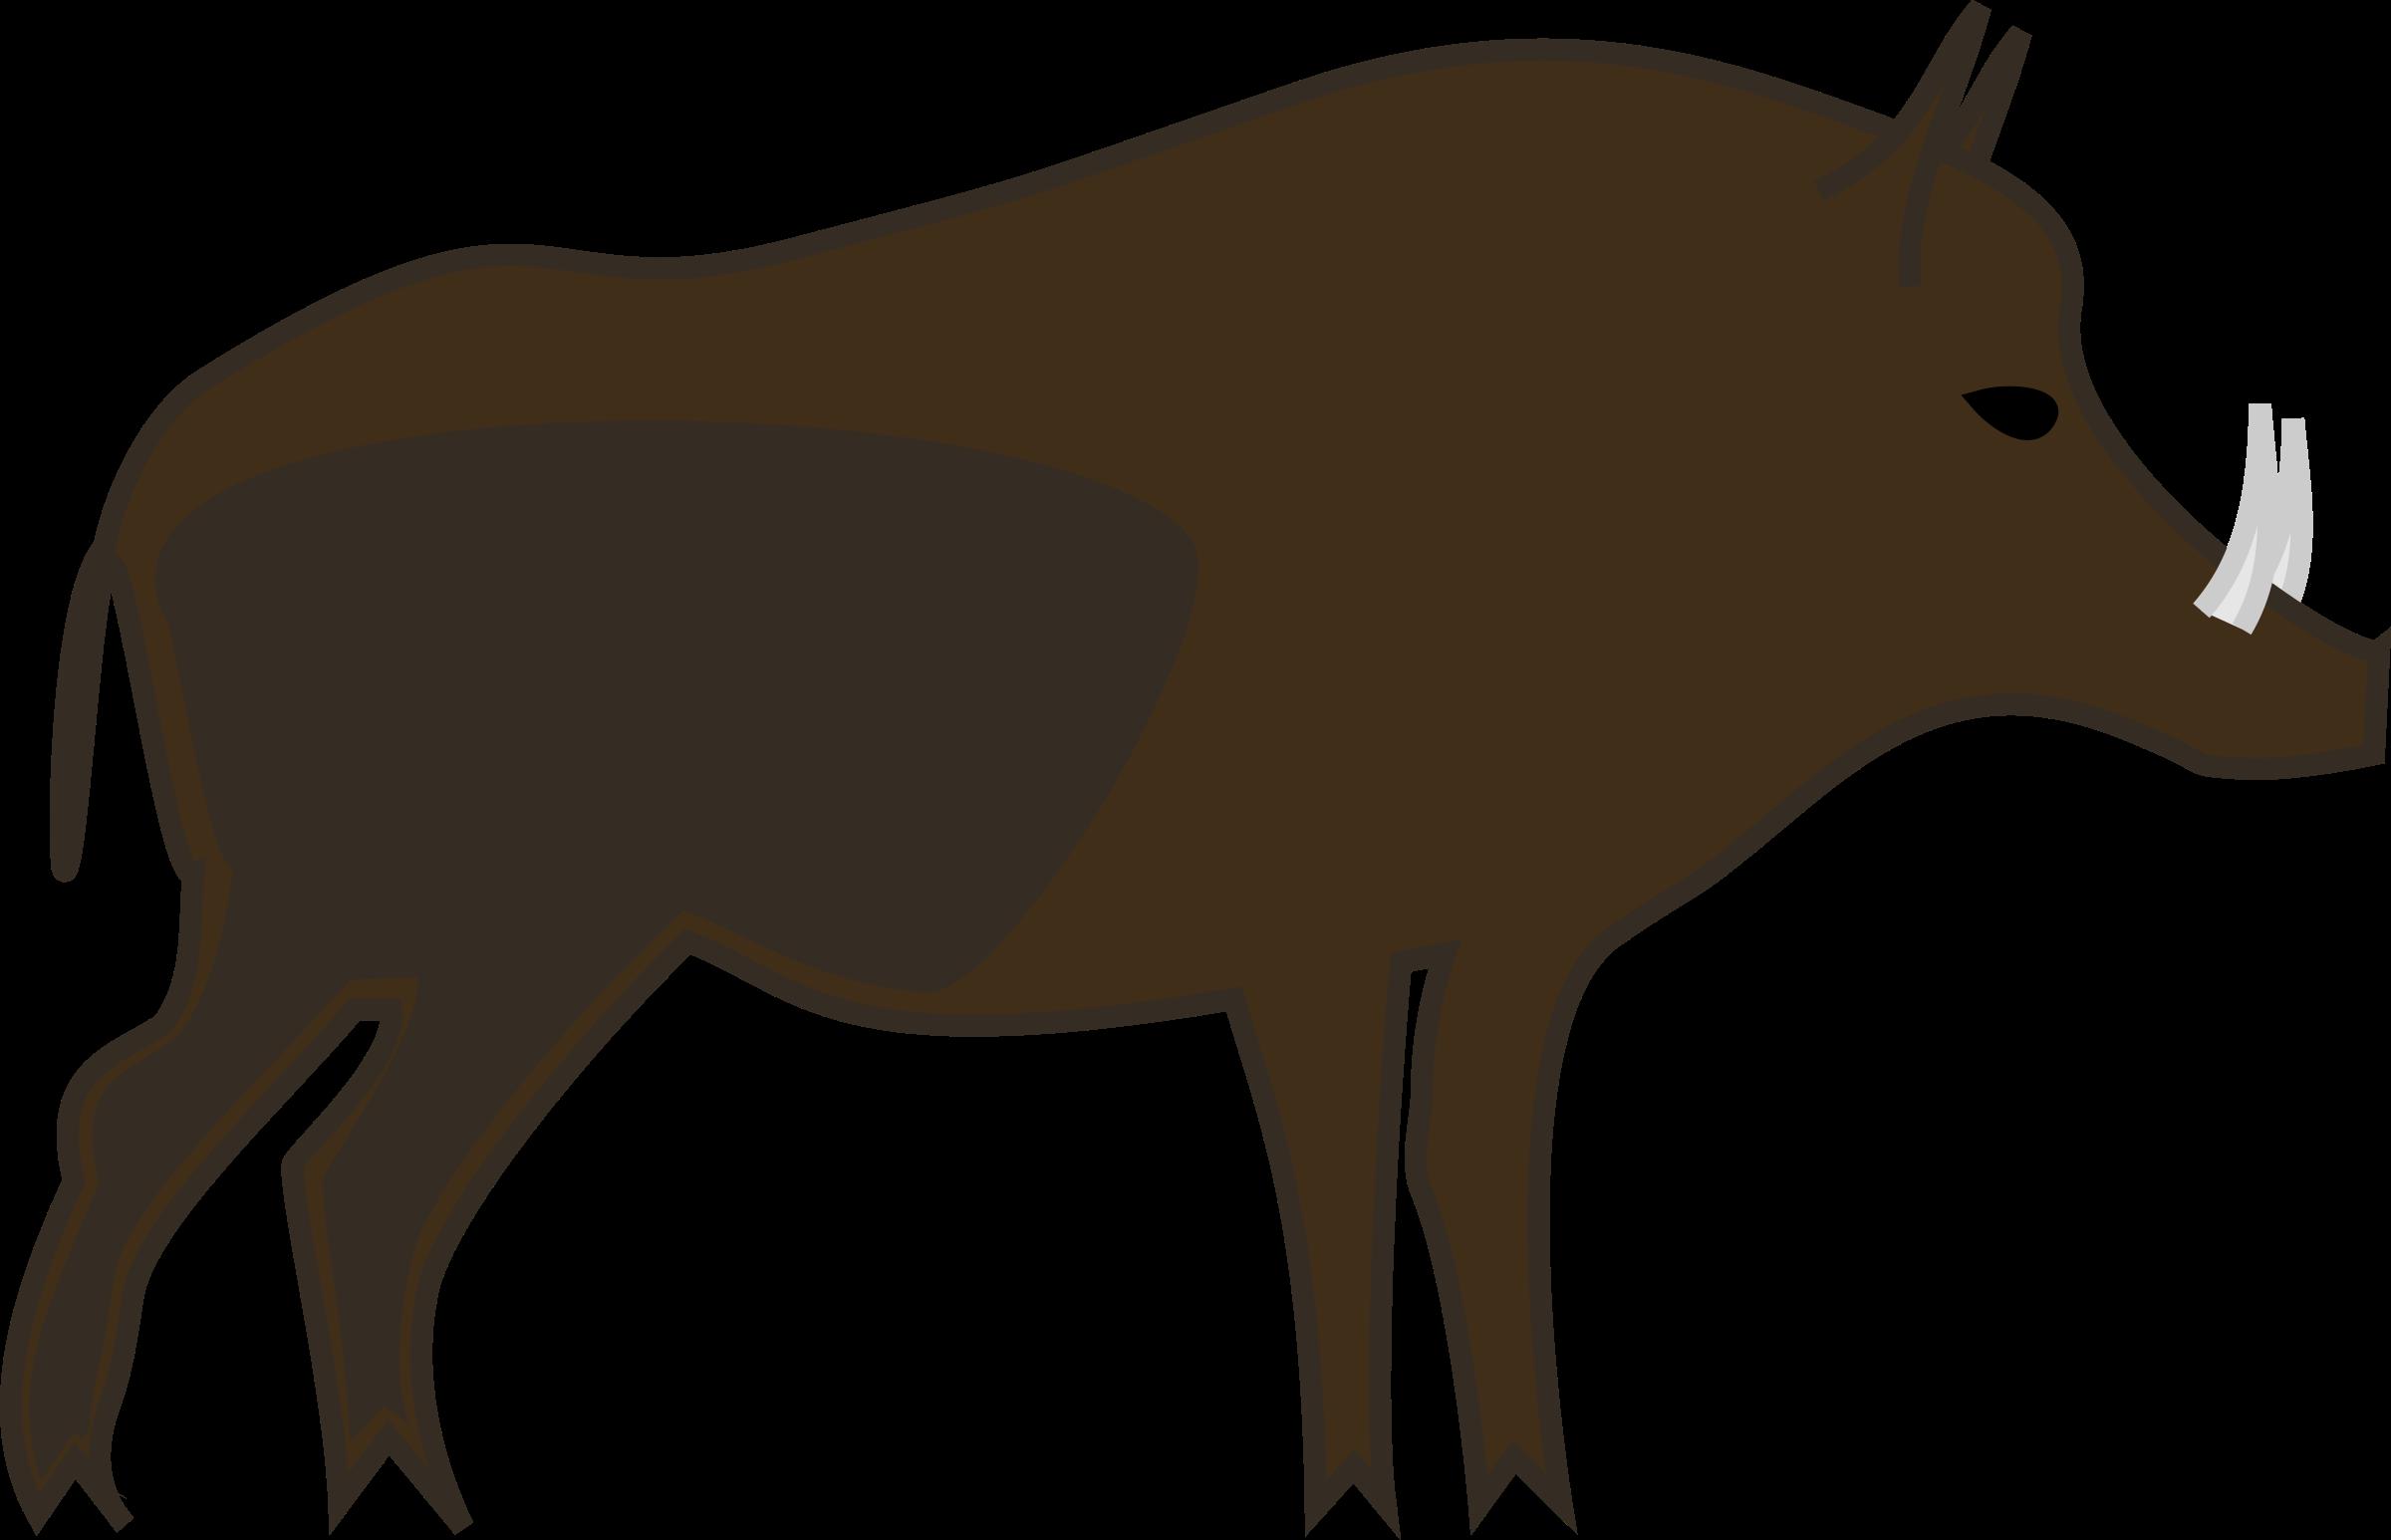 Boar,Warthog,Terrestrial animal,Suidae,Snout,Clip art,Livestock.